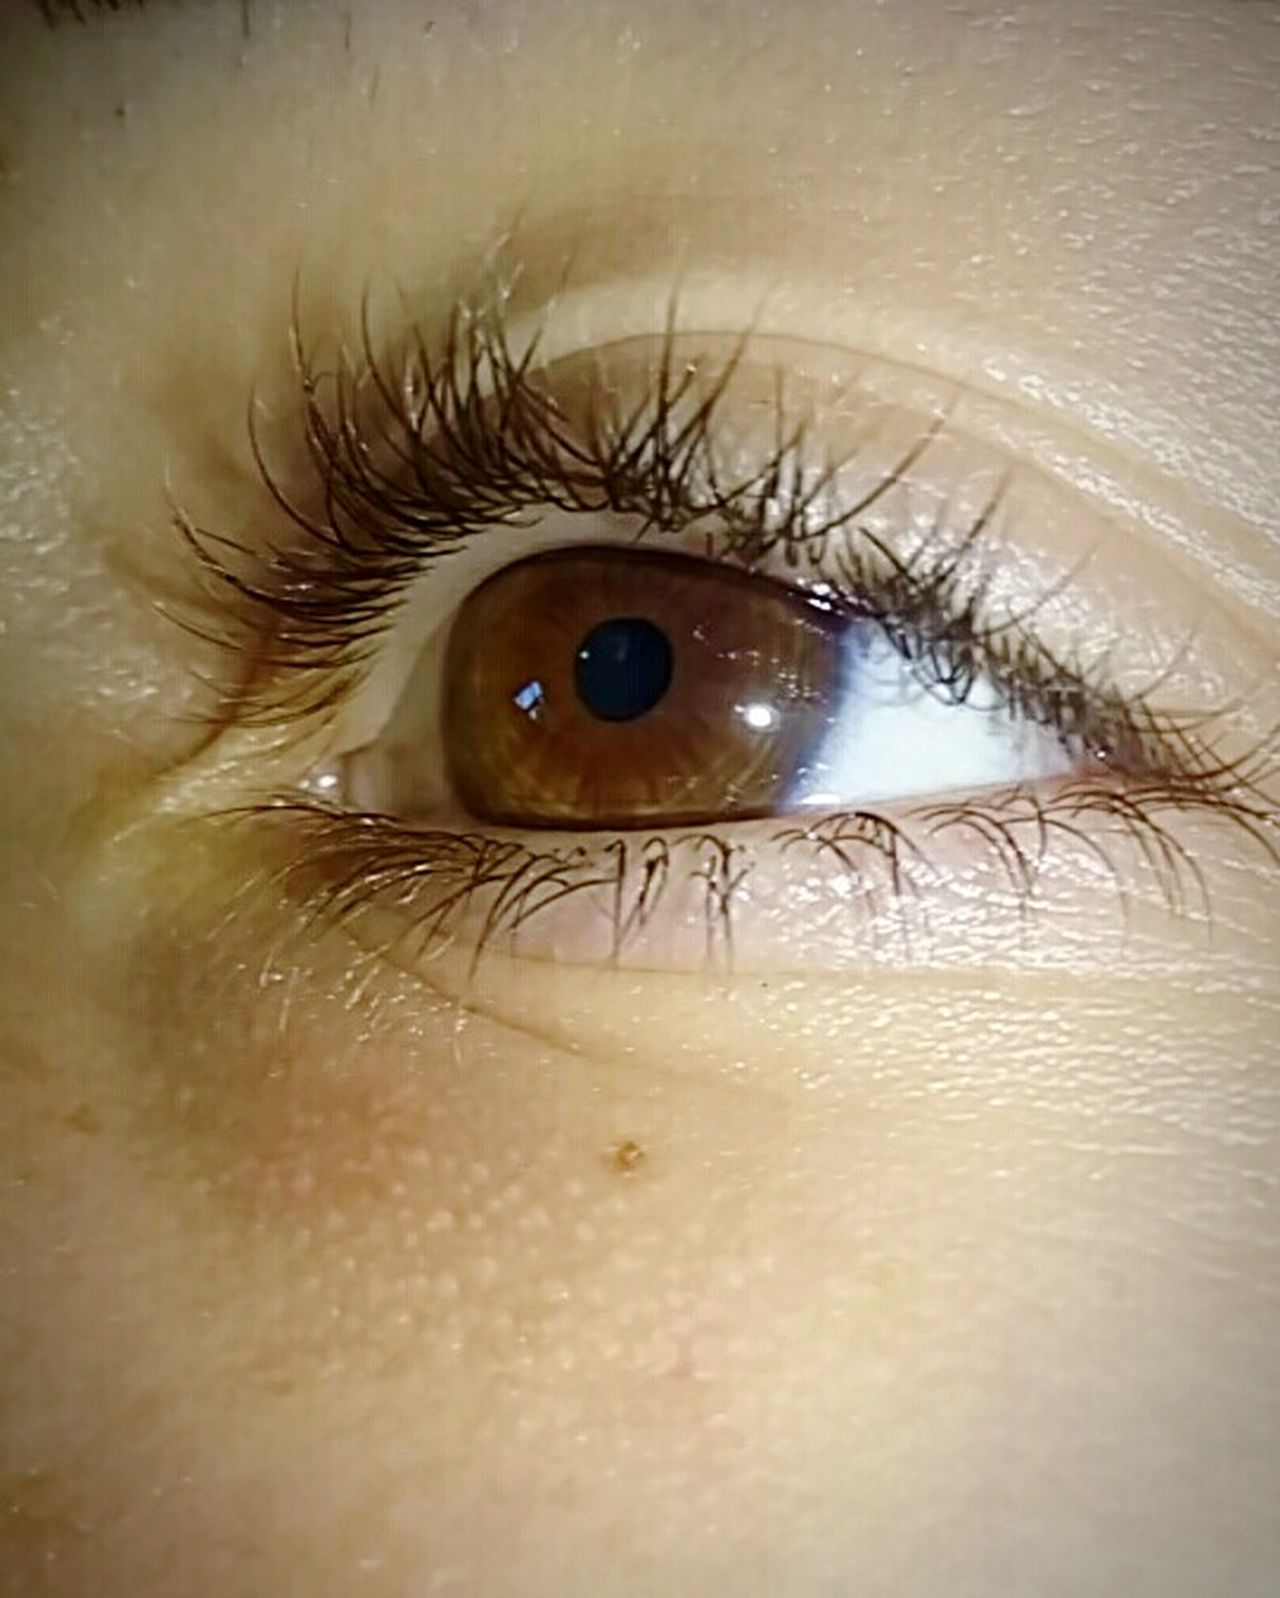 Browneyes Illumination Human Body Part Flashlight Looking At Camera Iris - Eye People Vibration